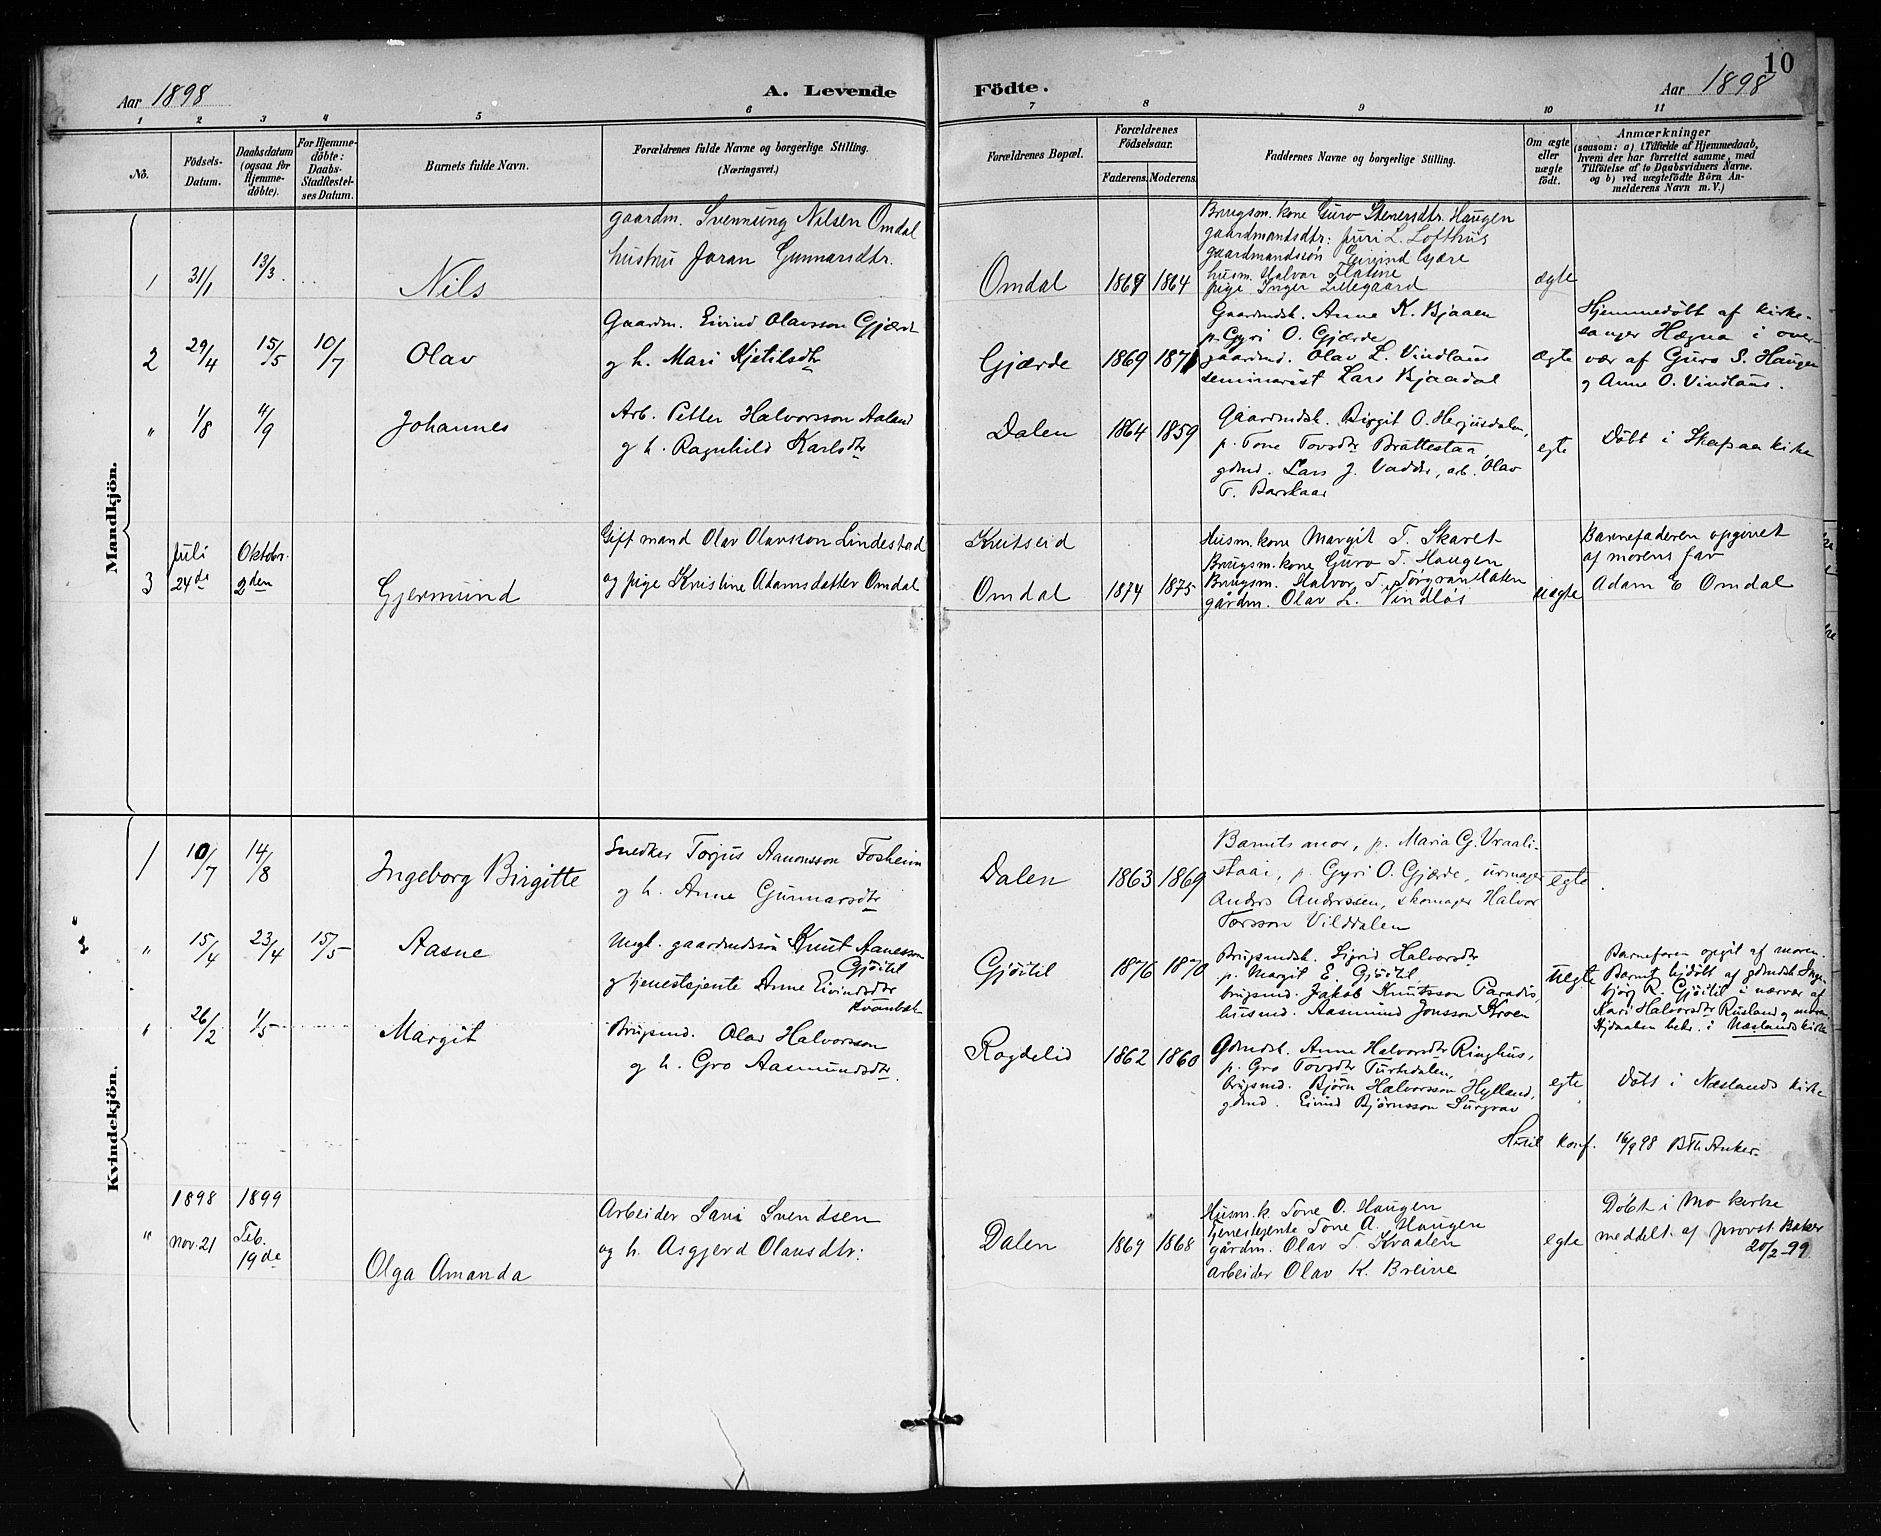 SAKO, Lårdal kirkebøker, G/Gb/L0003: Klokkerbok nr. II 3, 1889-1920, s. 10